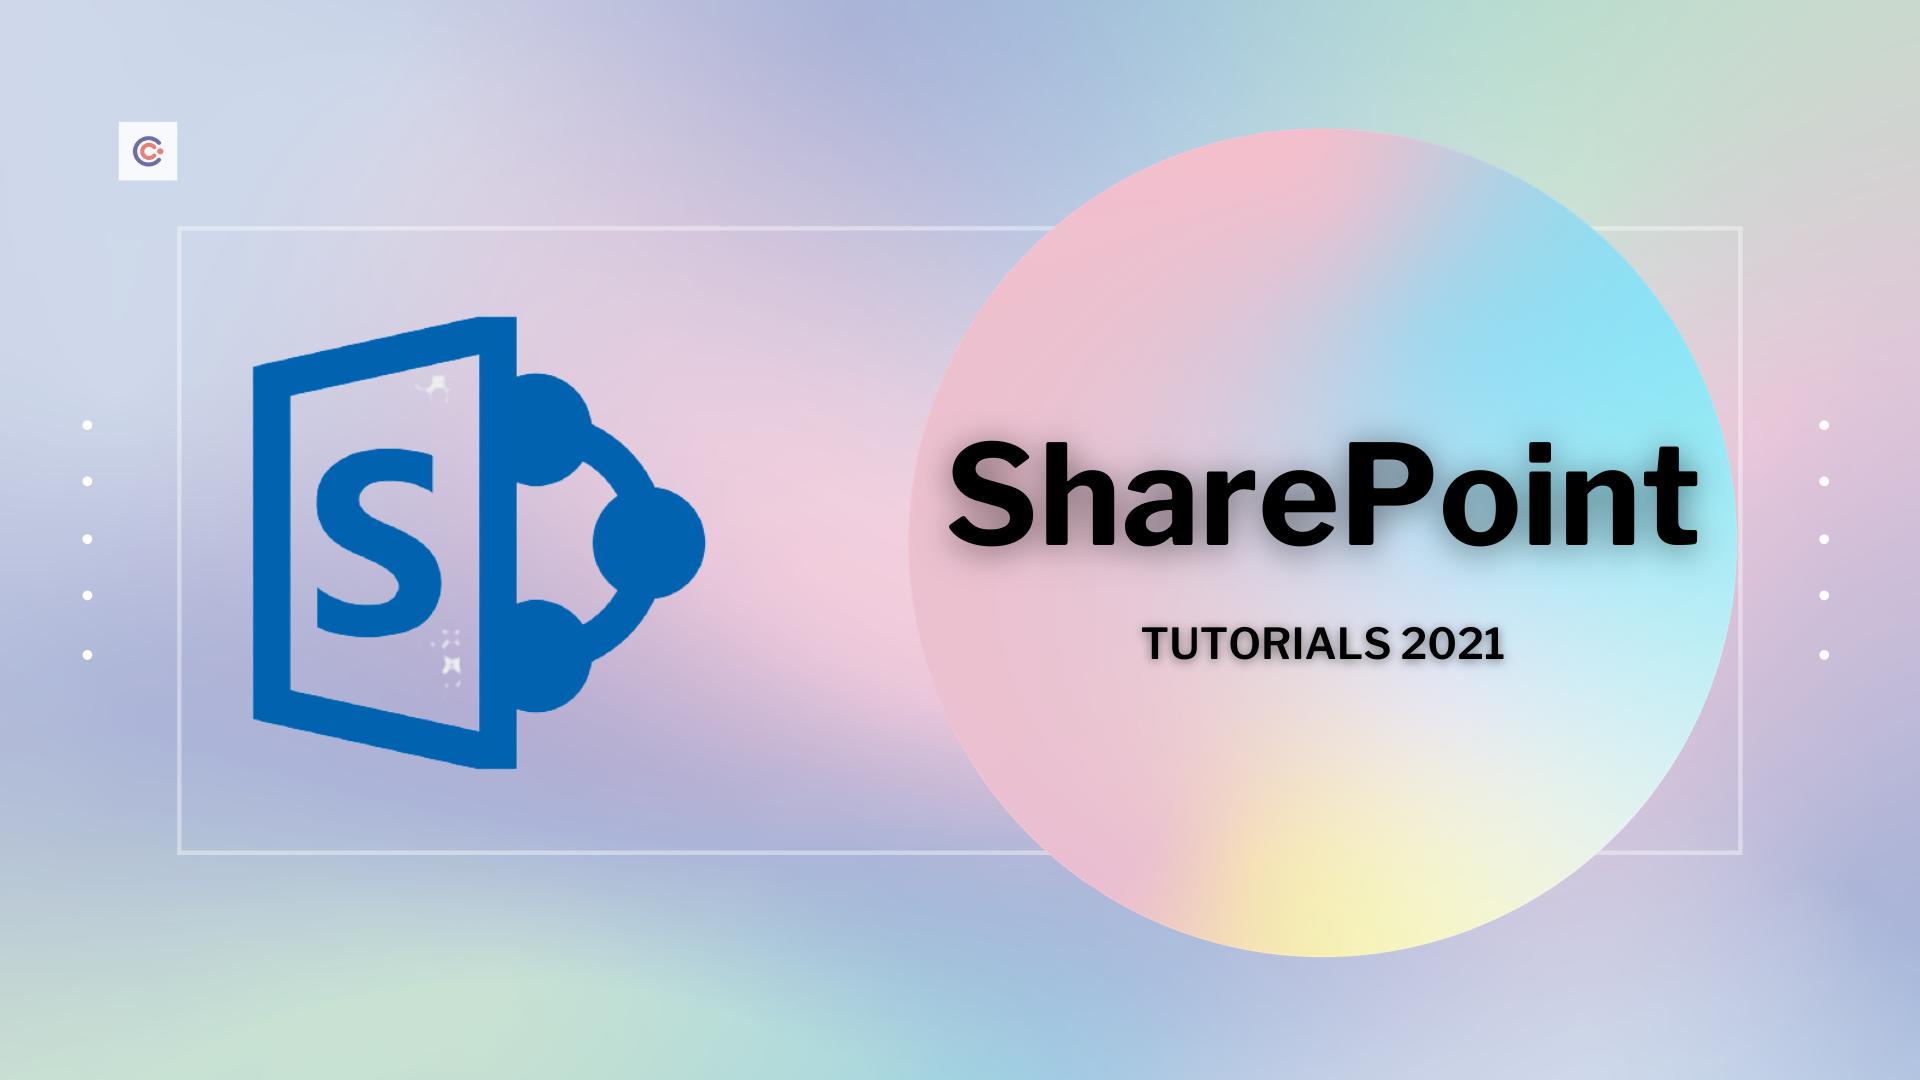 10 Best SharePoint Tutorials - Learn SharePoint Online